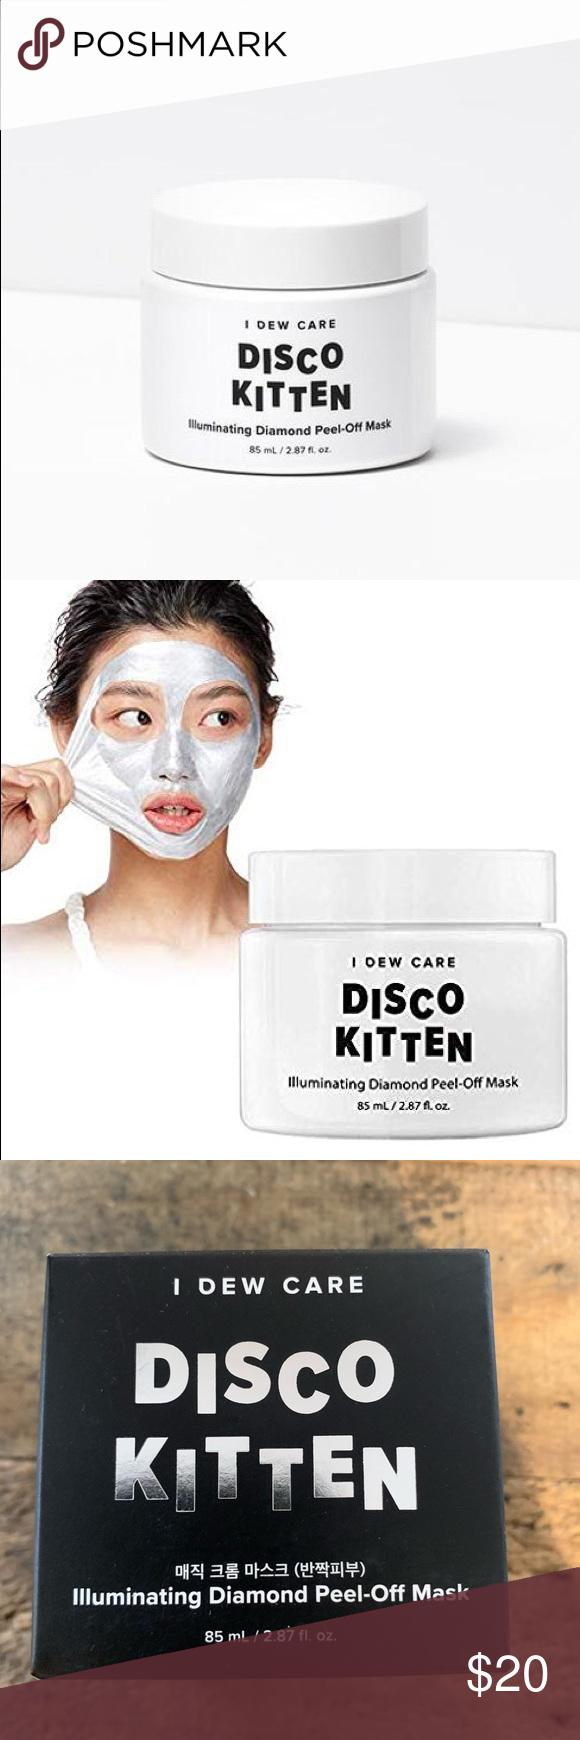 I Dew Care Illuminating Diamond Peel Off Mask In 2020 Peel Off Mask Skin Care Mask How To Exfoliate Skin